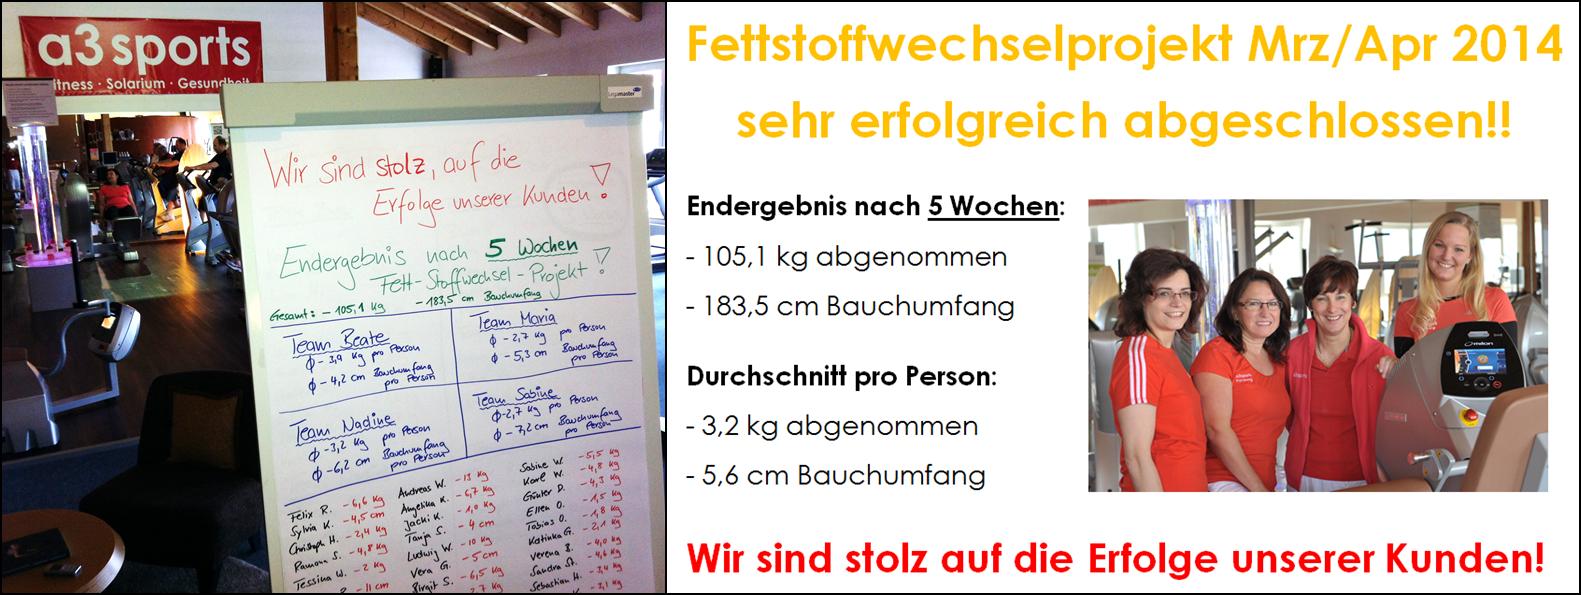 fb_FSW-Mrz+Apr-2014_Endergebnis-Gesamtbild